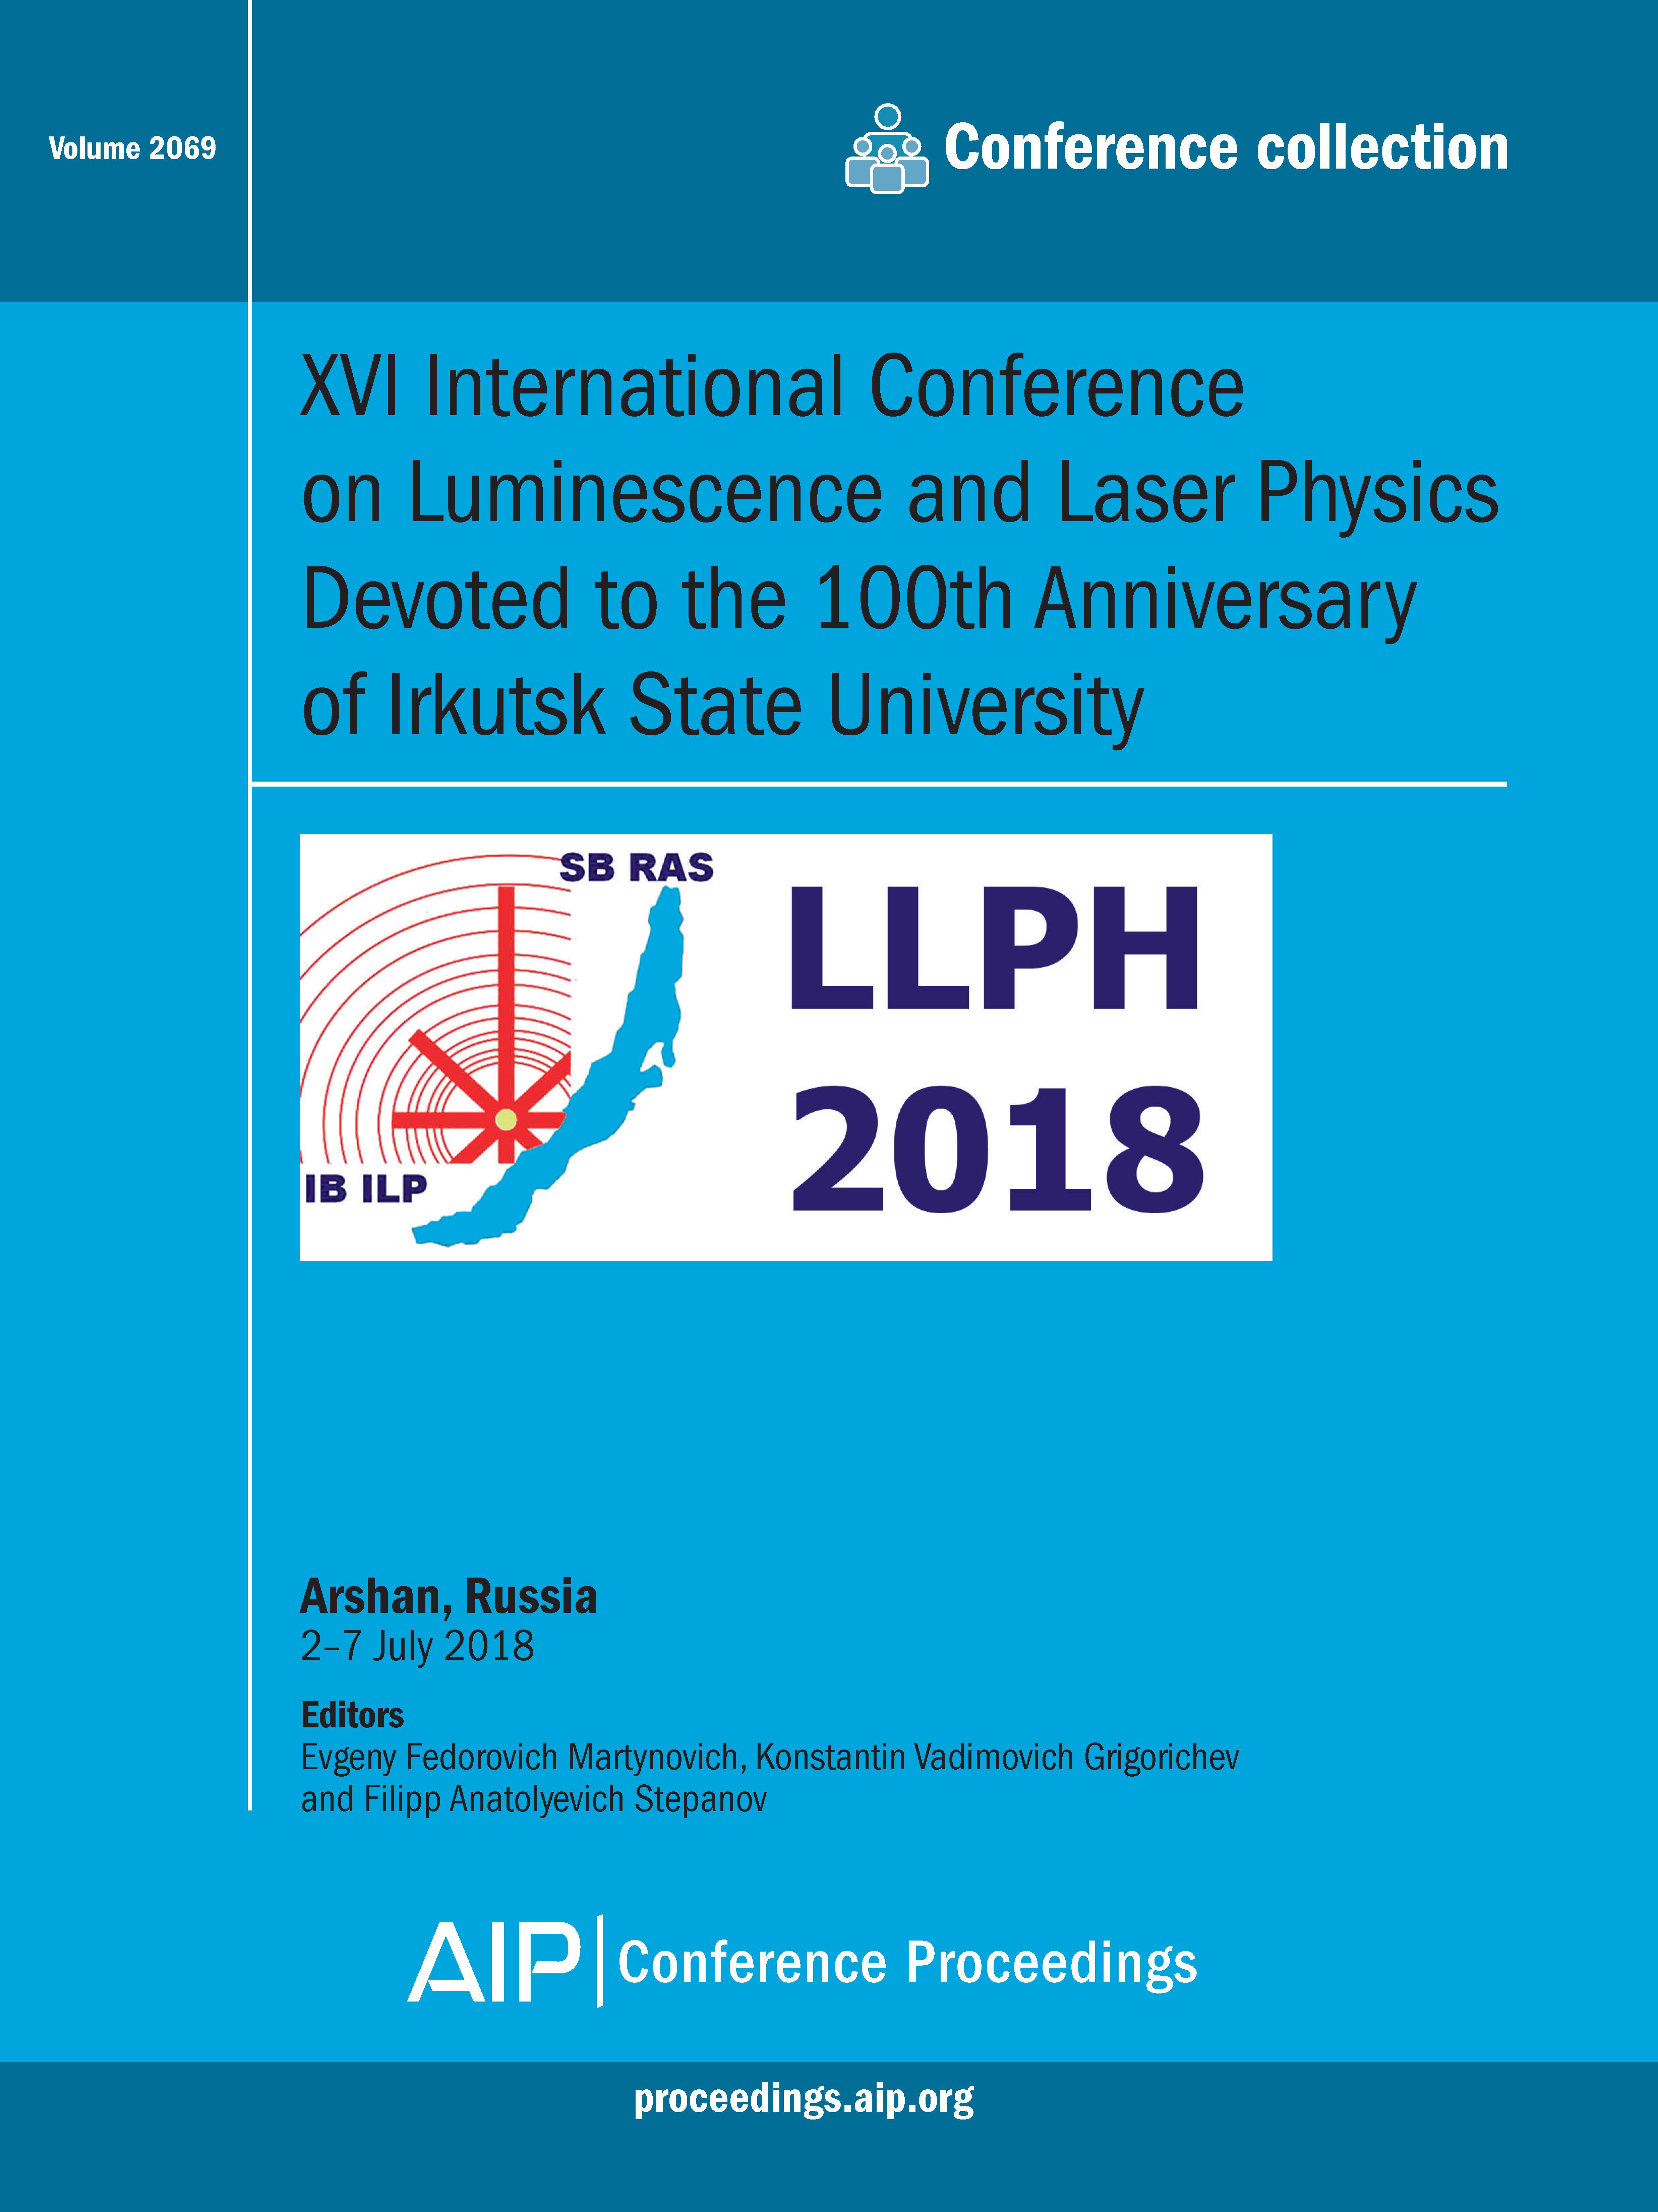 Volume 2069: XVI International Conference on Luminescence